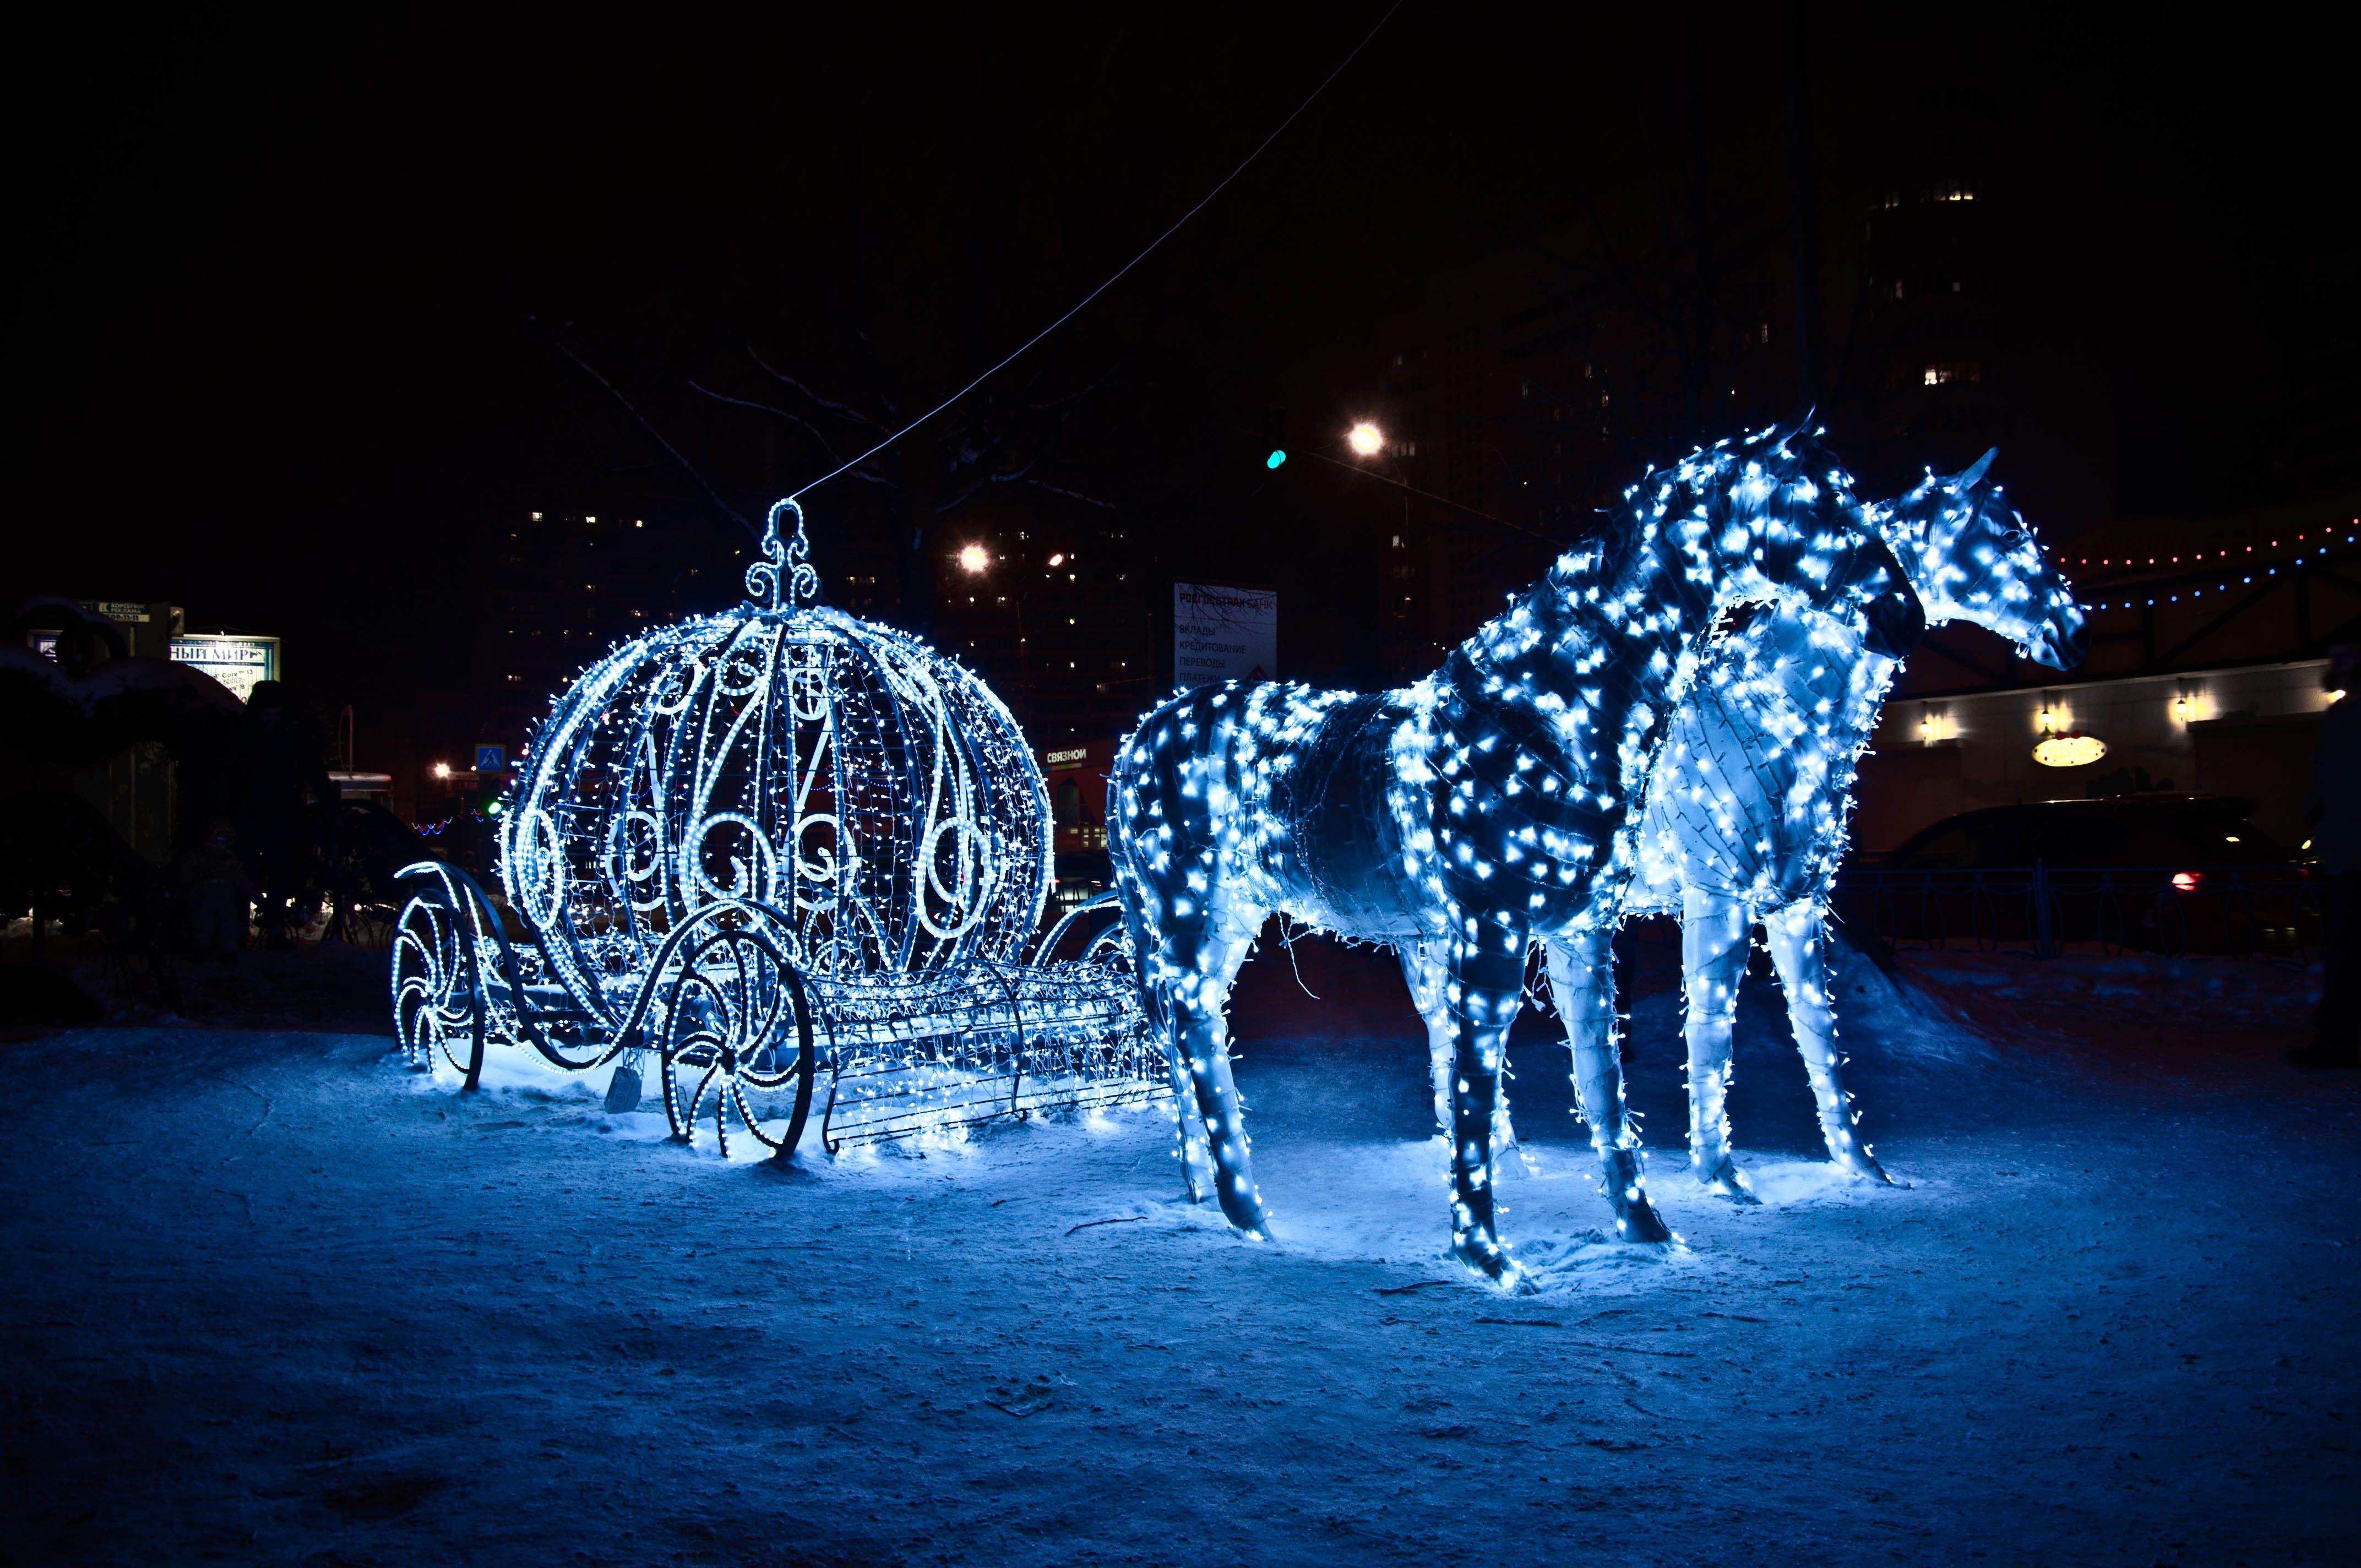 Fonds D Ecran Cheval Illuminations De Noel Neige Nuit Image 331548 Telecharger Sculptures De Neige Illuminations De Noel Merveilles D Hiver